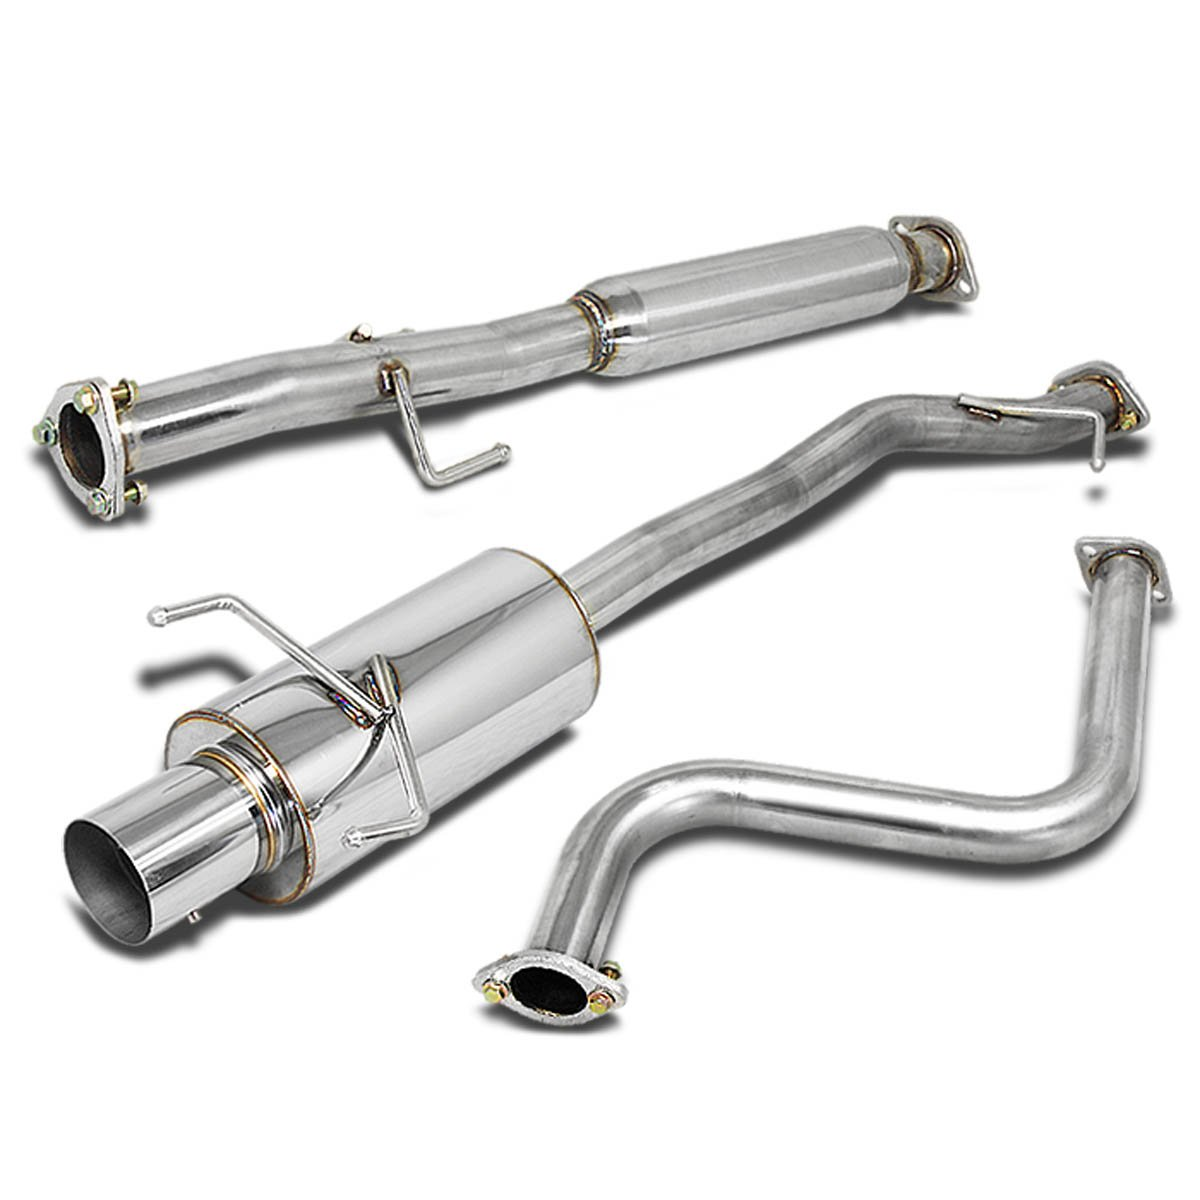 For Honda Accord Stainless Steel 4'' Muffler Tip Catback Exhaust System - 4th Gen CB7 CB9 F22